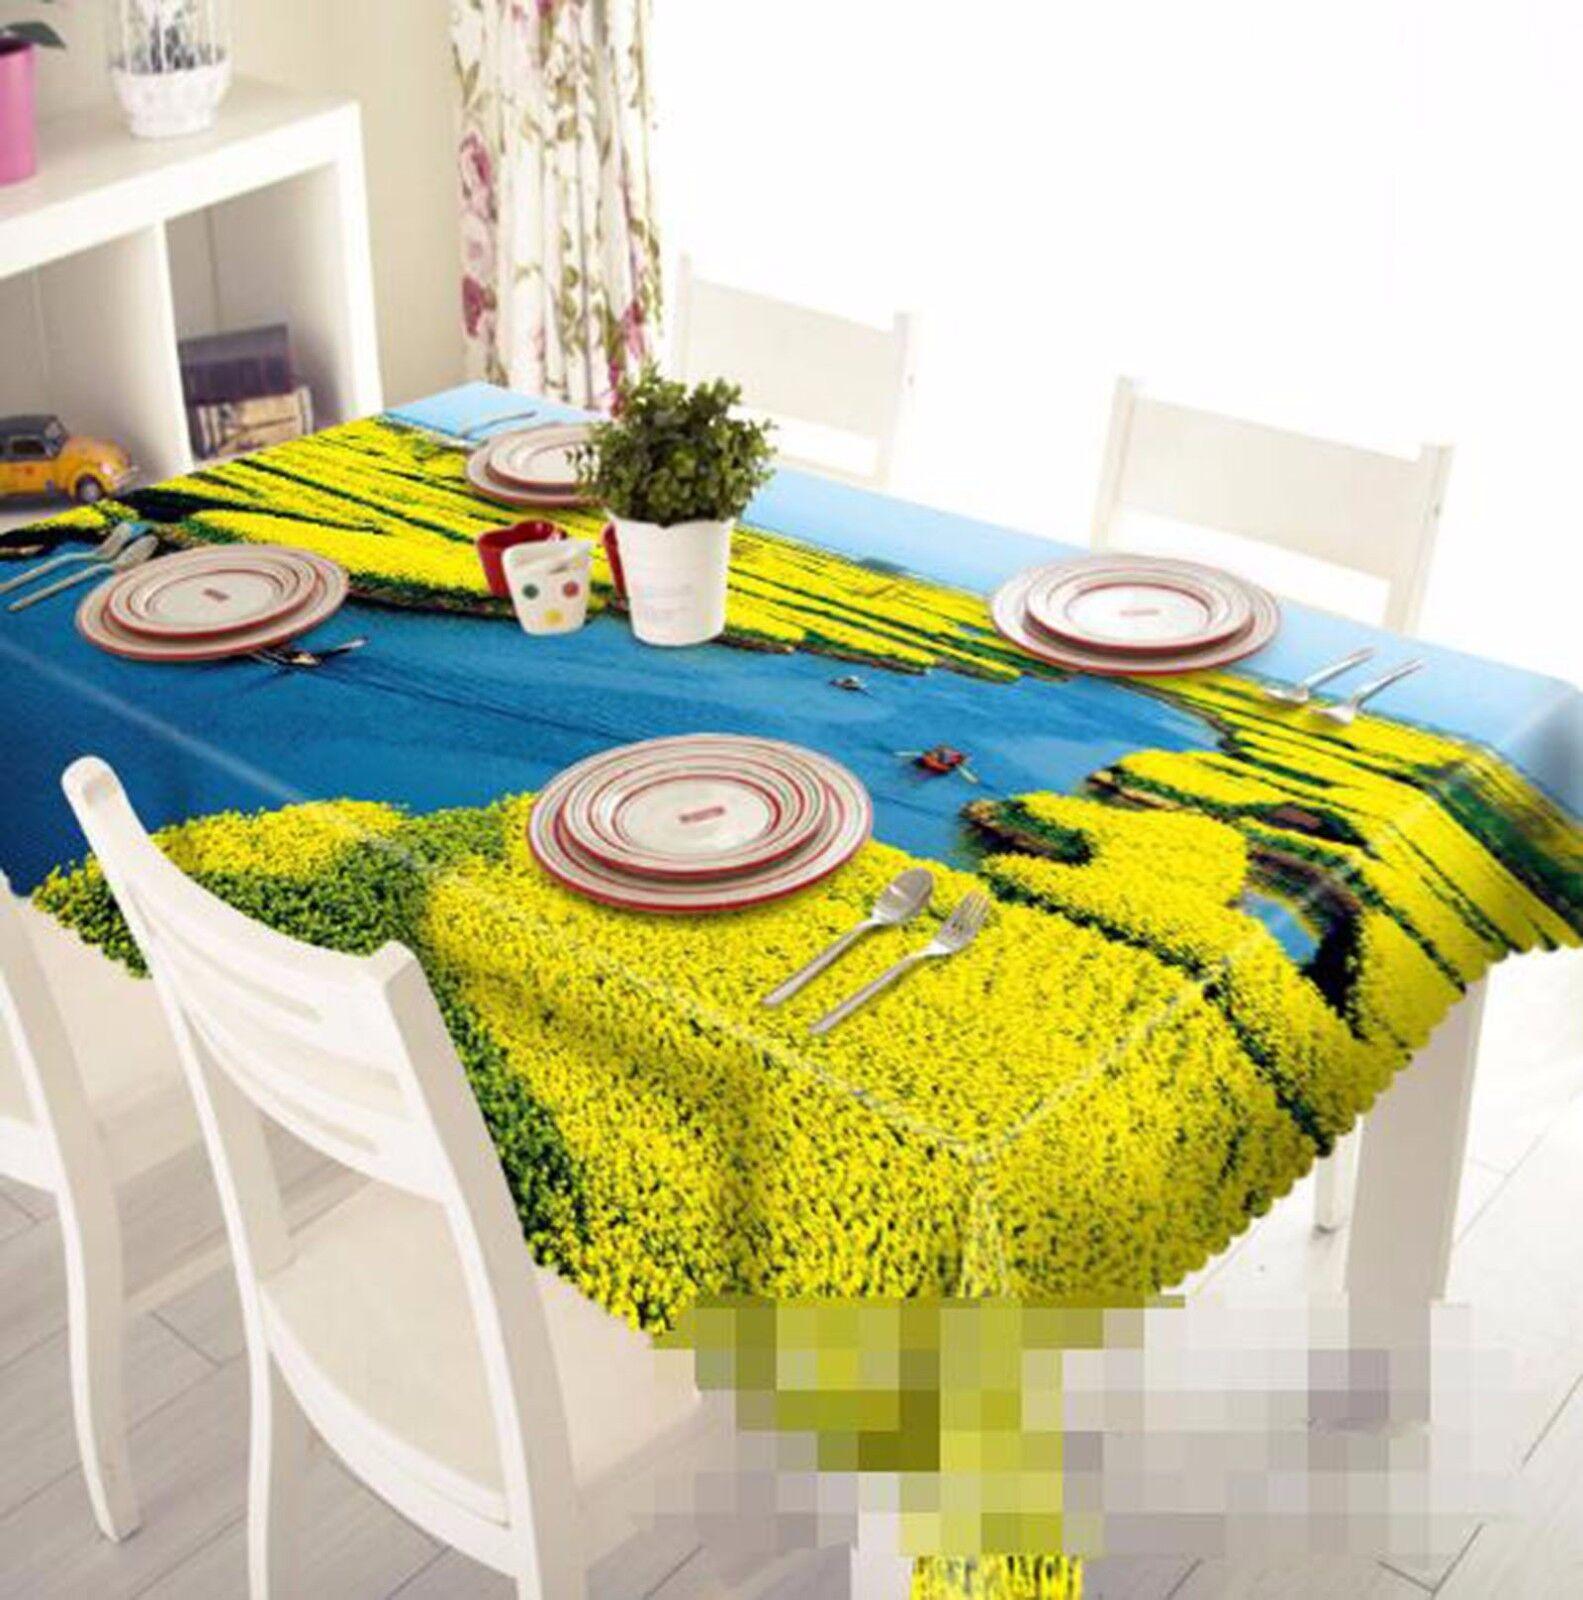 3D 3D 3D Rape River Tablecloth Table Cover Cloth Birthday Party AJ WALLPAPER UK Lemon e5e7d4